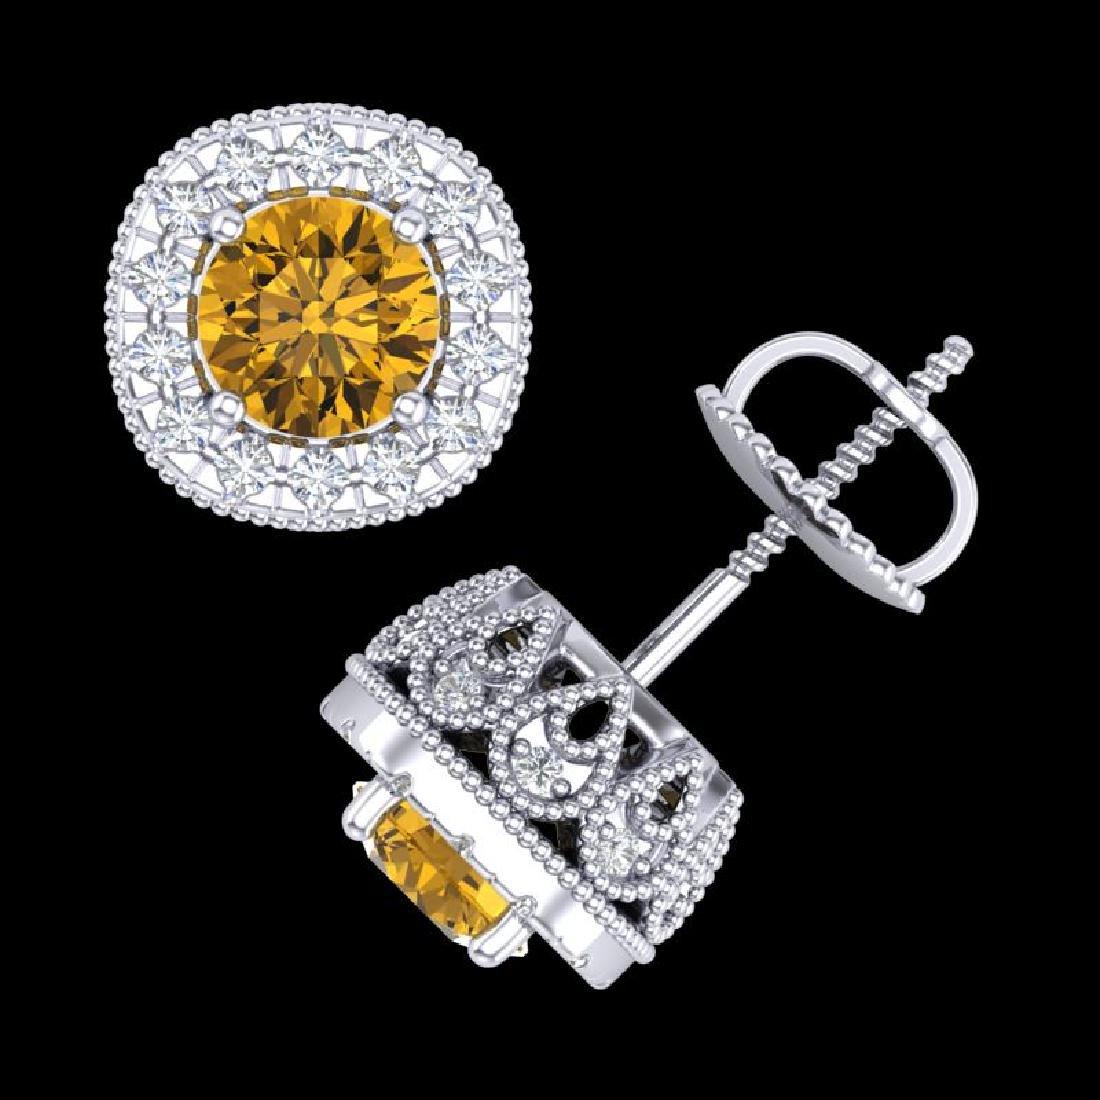 1.69 CTW Intense Fancy Yellow Diamond Art Deco Stud - 3